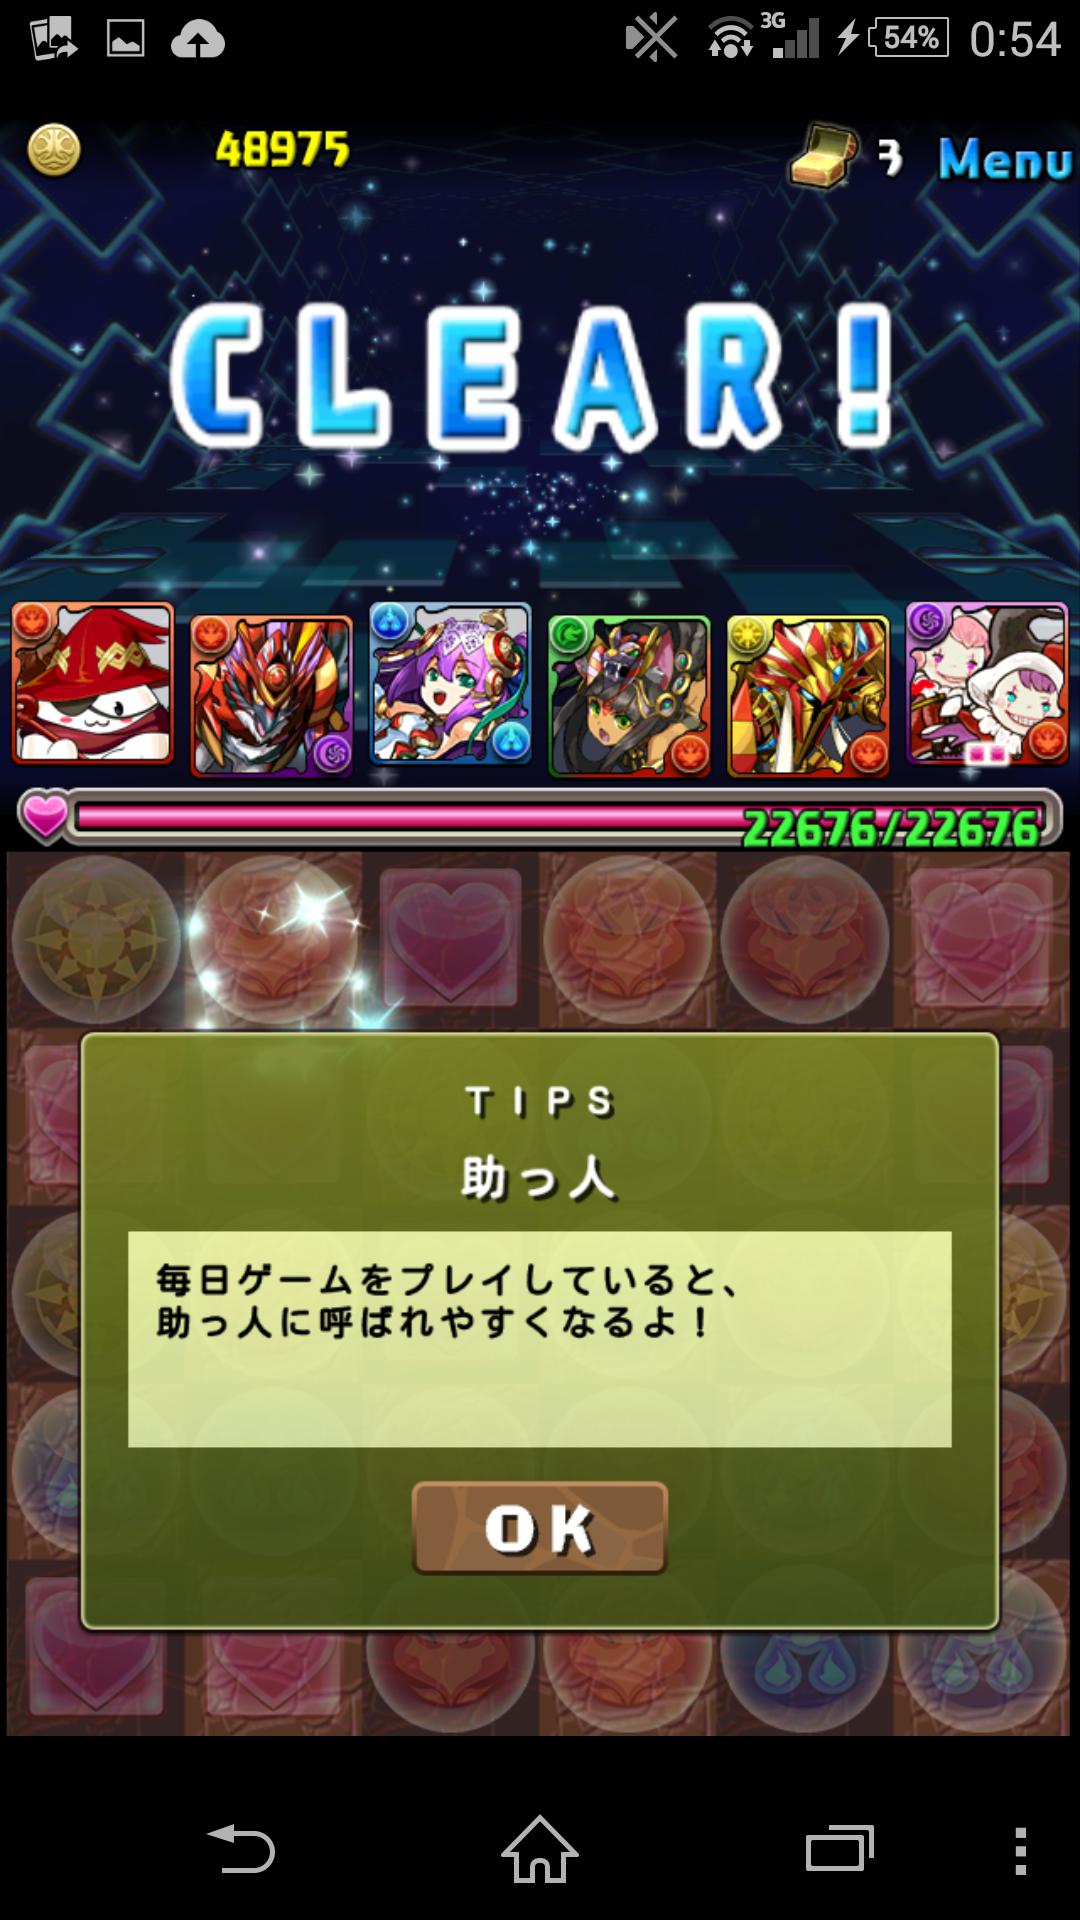 Screenshot_2015-04-10-00-54-19.png